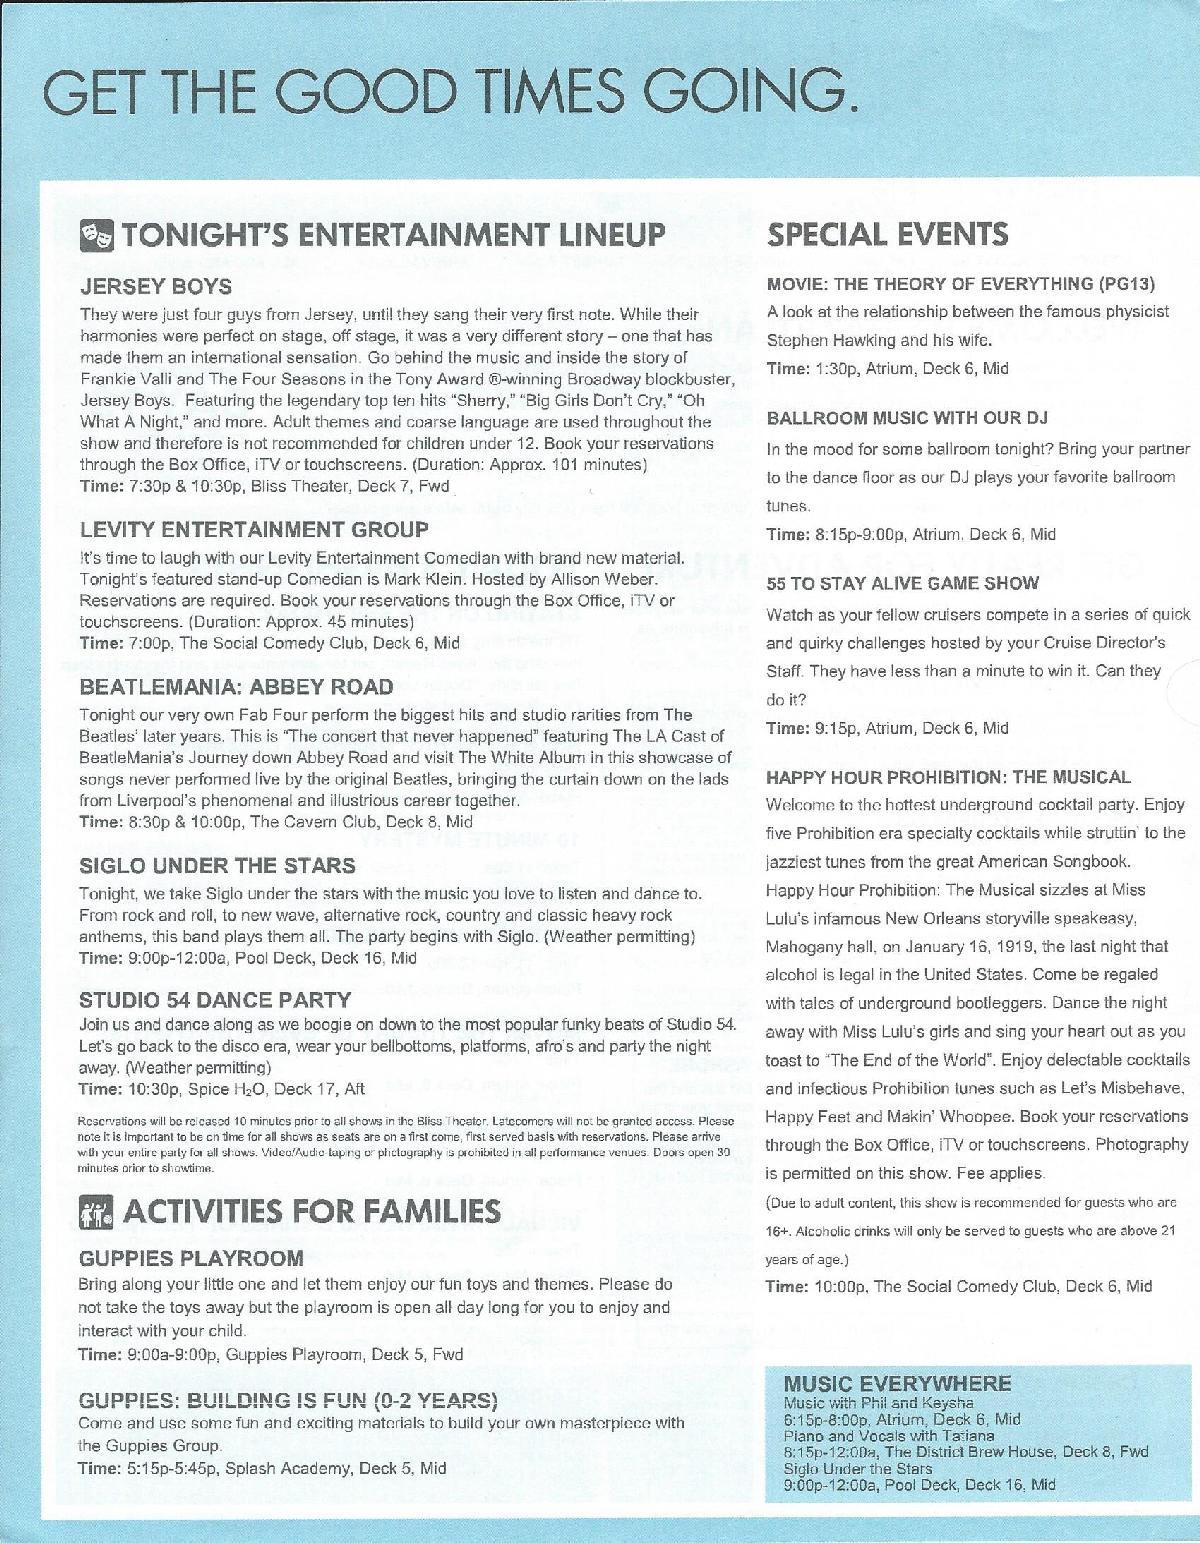 Norwegian Bliss Review: Activities, Events, Entertainment